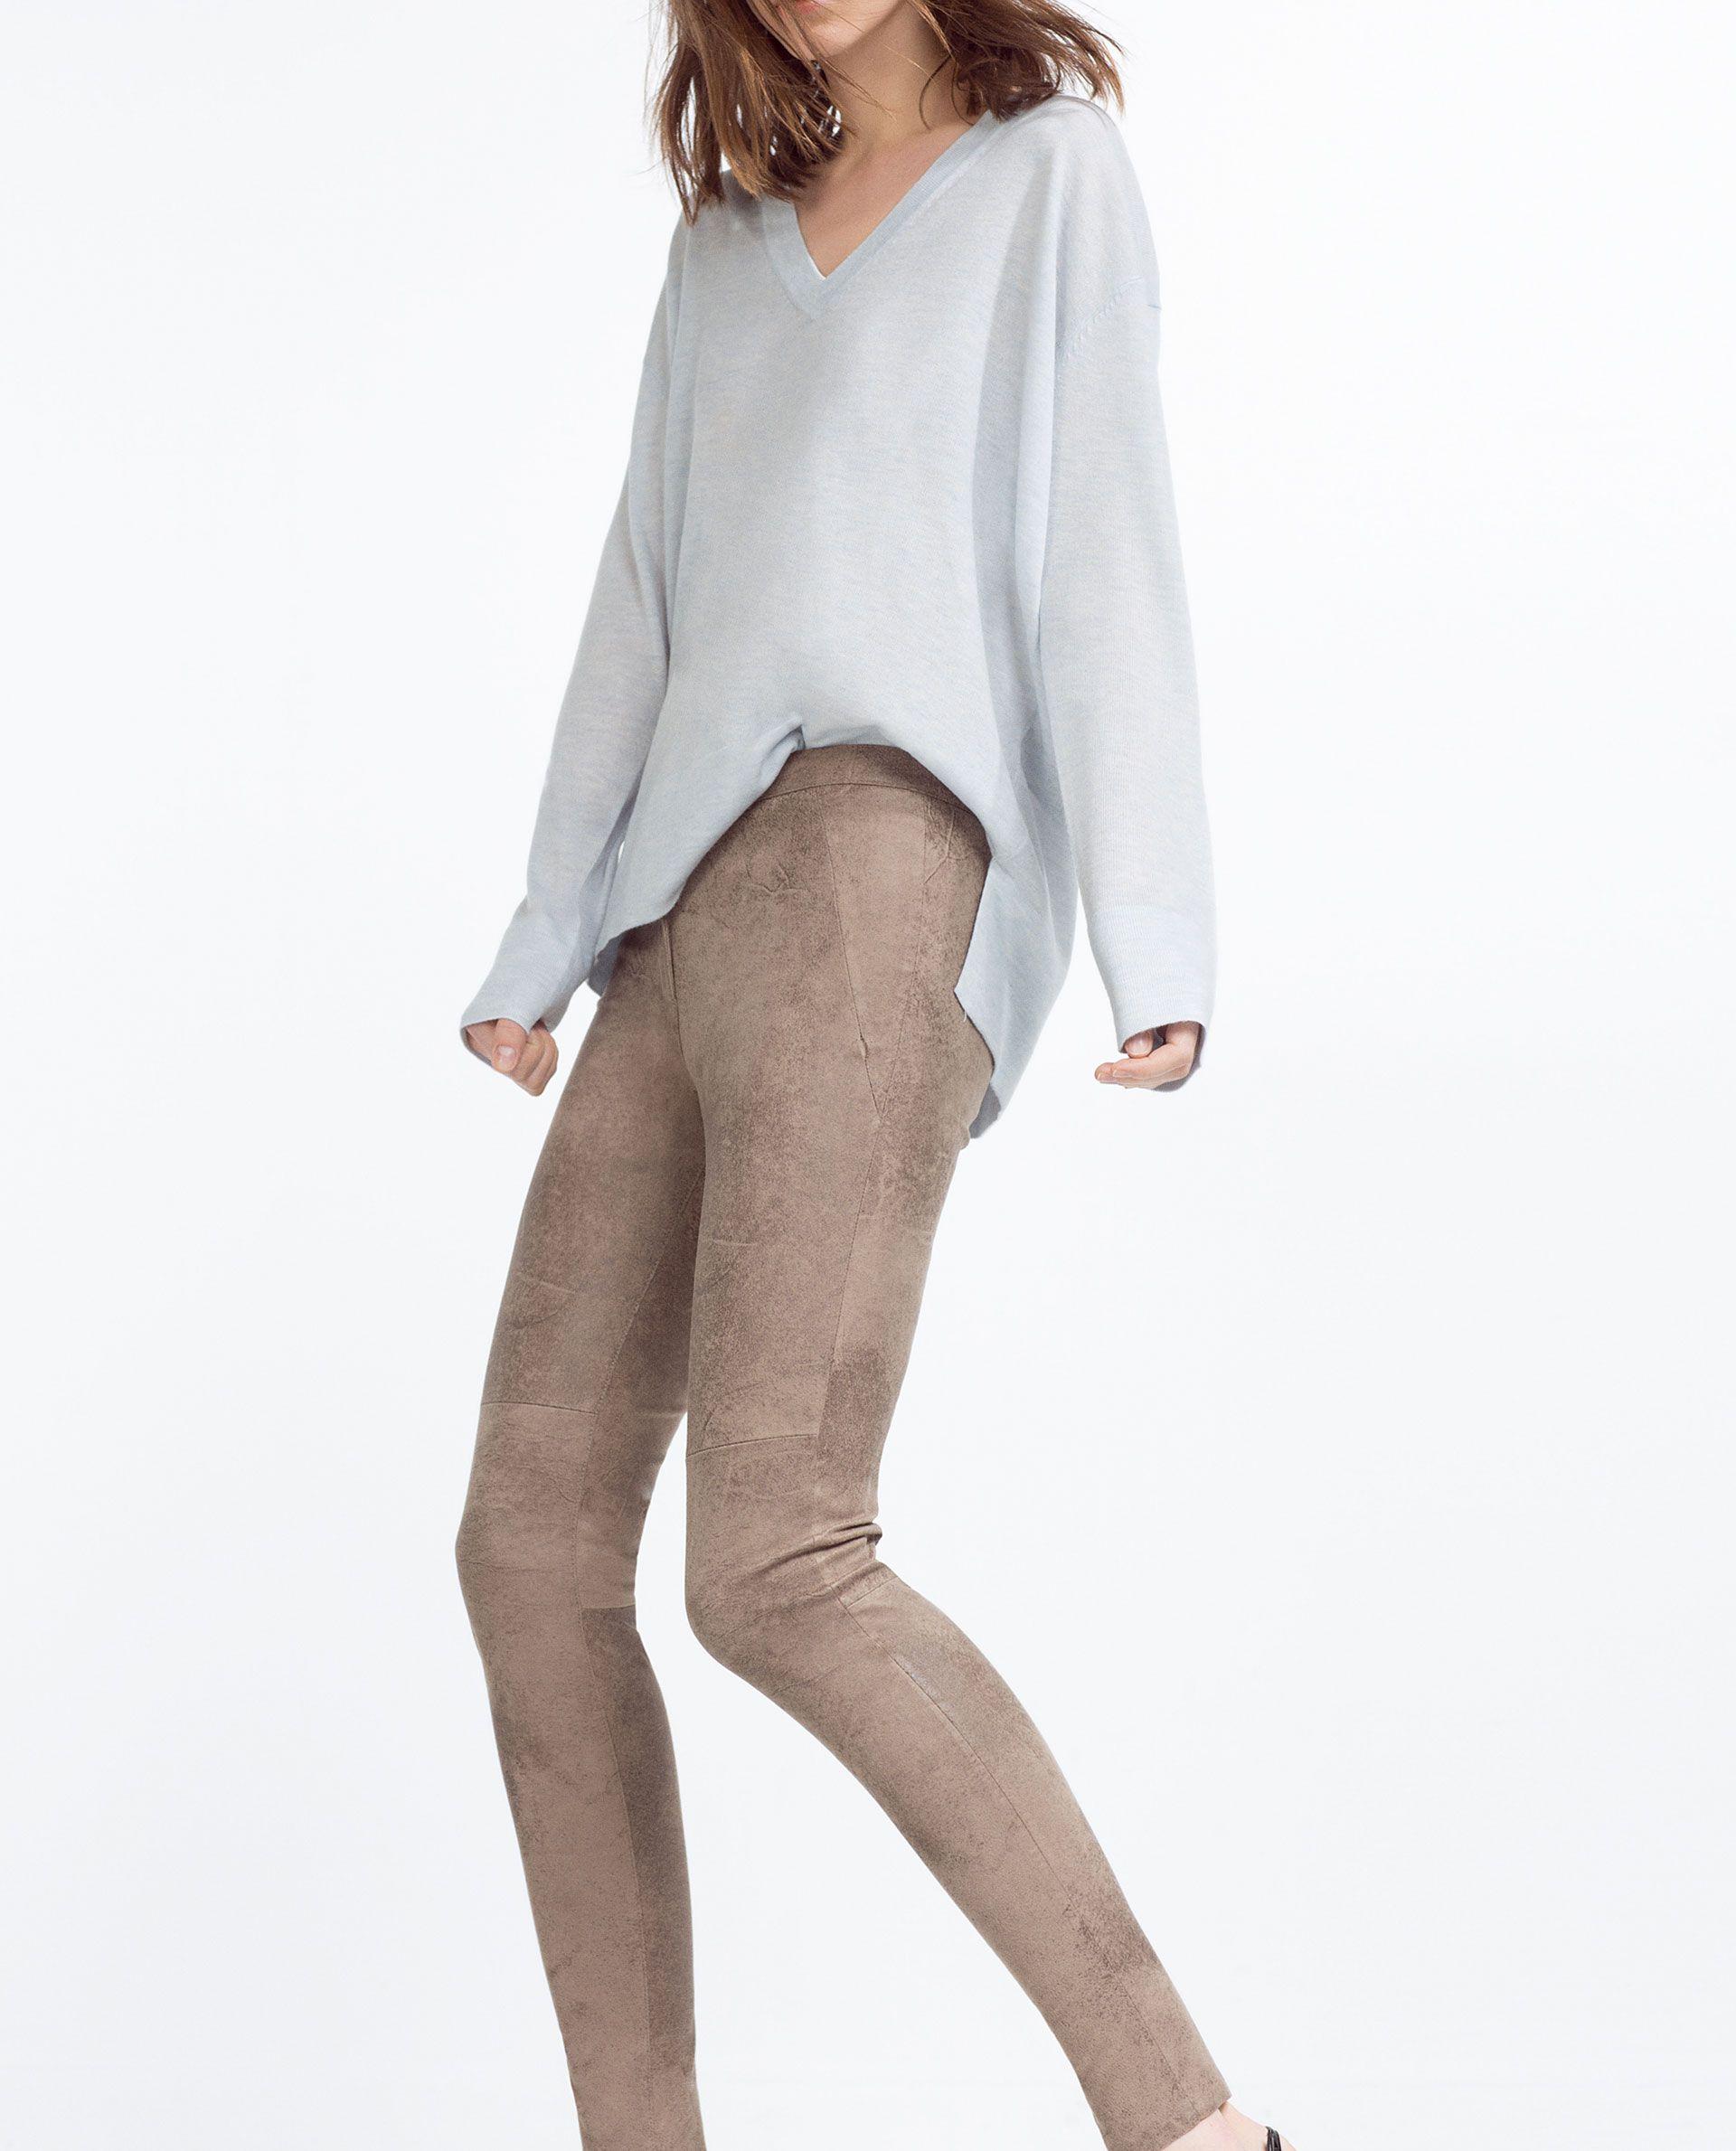 pantalon skinny effet daim tout voir pantalons femme. Black Bedroom Furniture Sets. Home Design Ideas